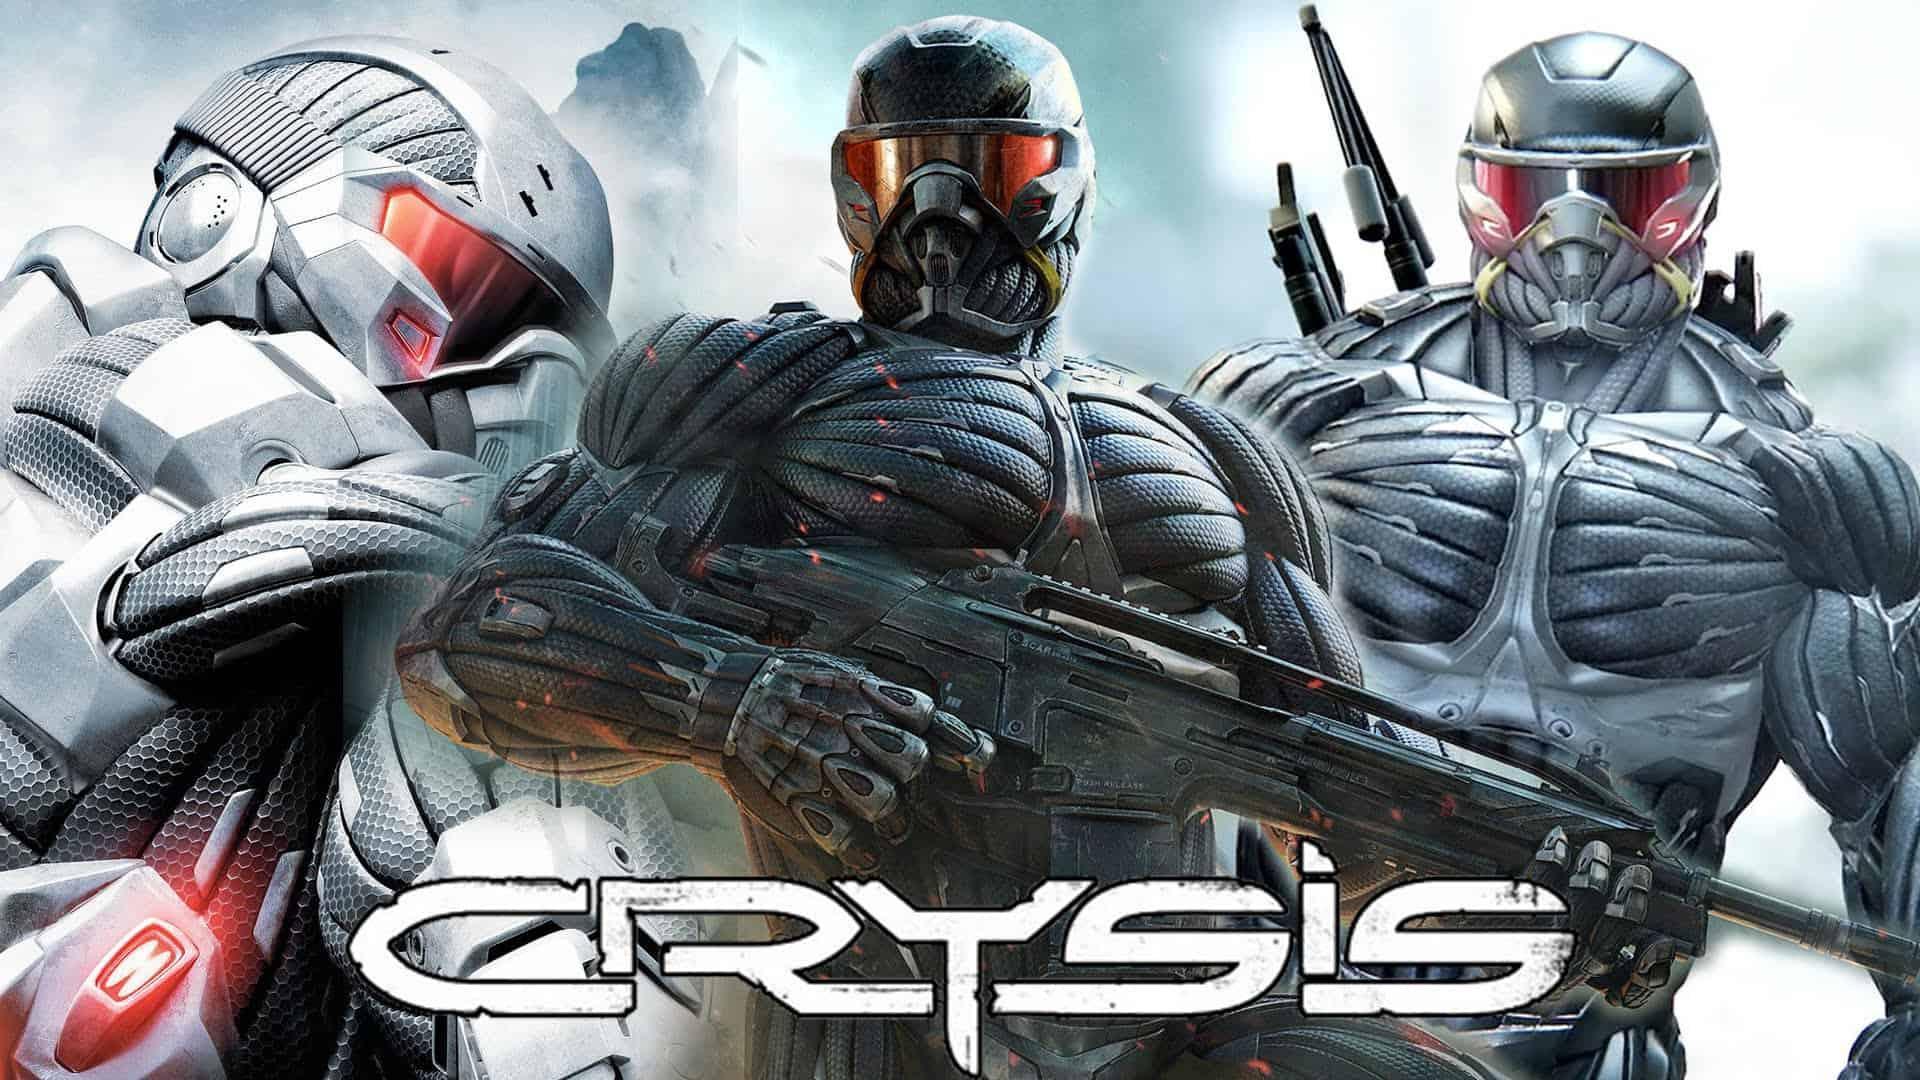 Crysis free game for windows